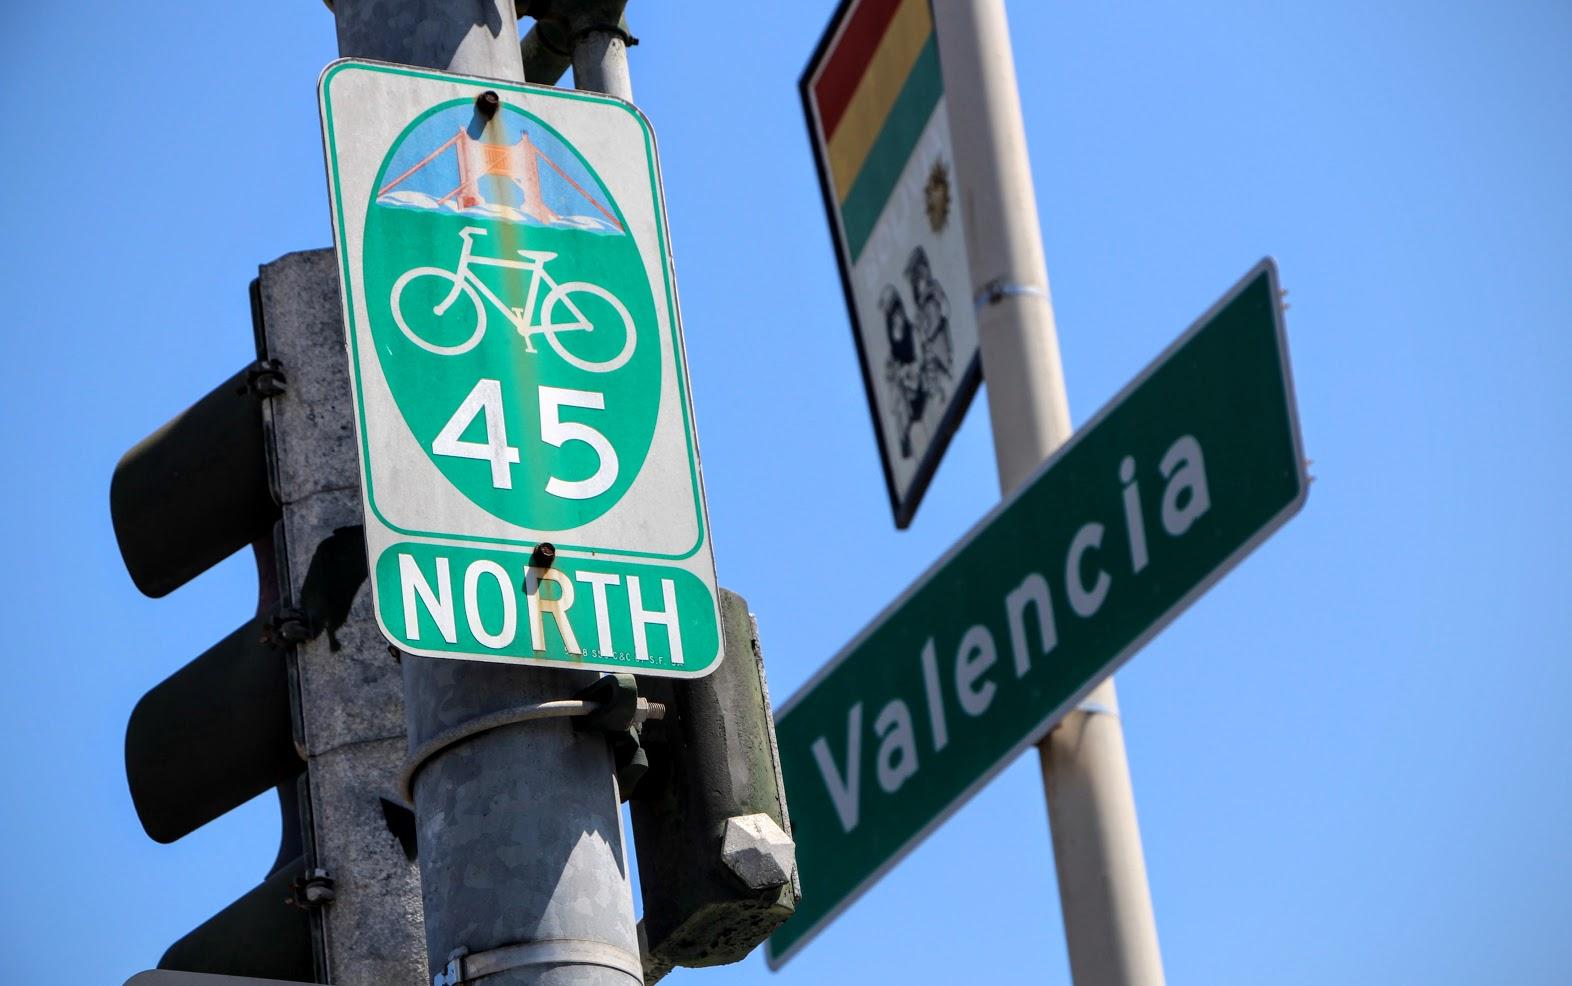 valencia-street-san-francisco-1